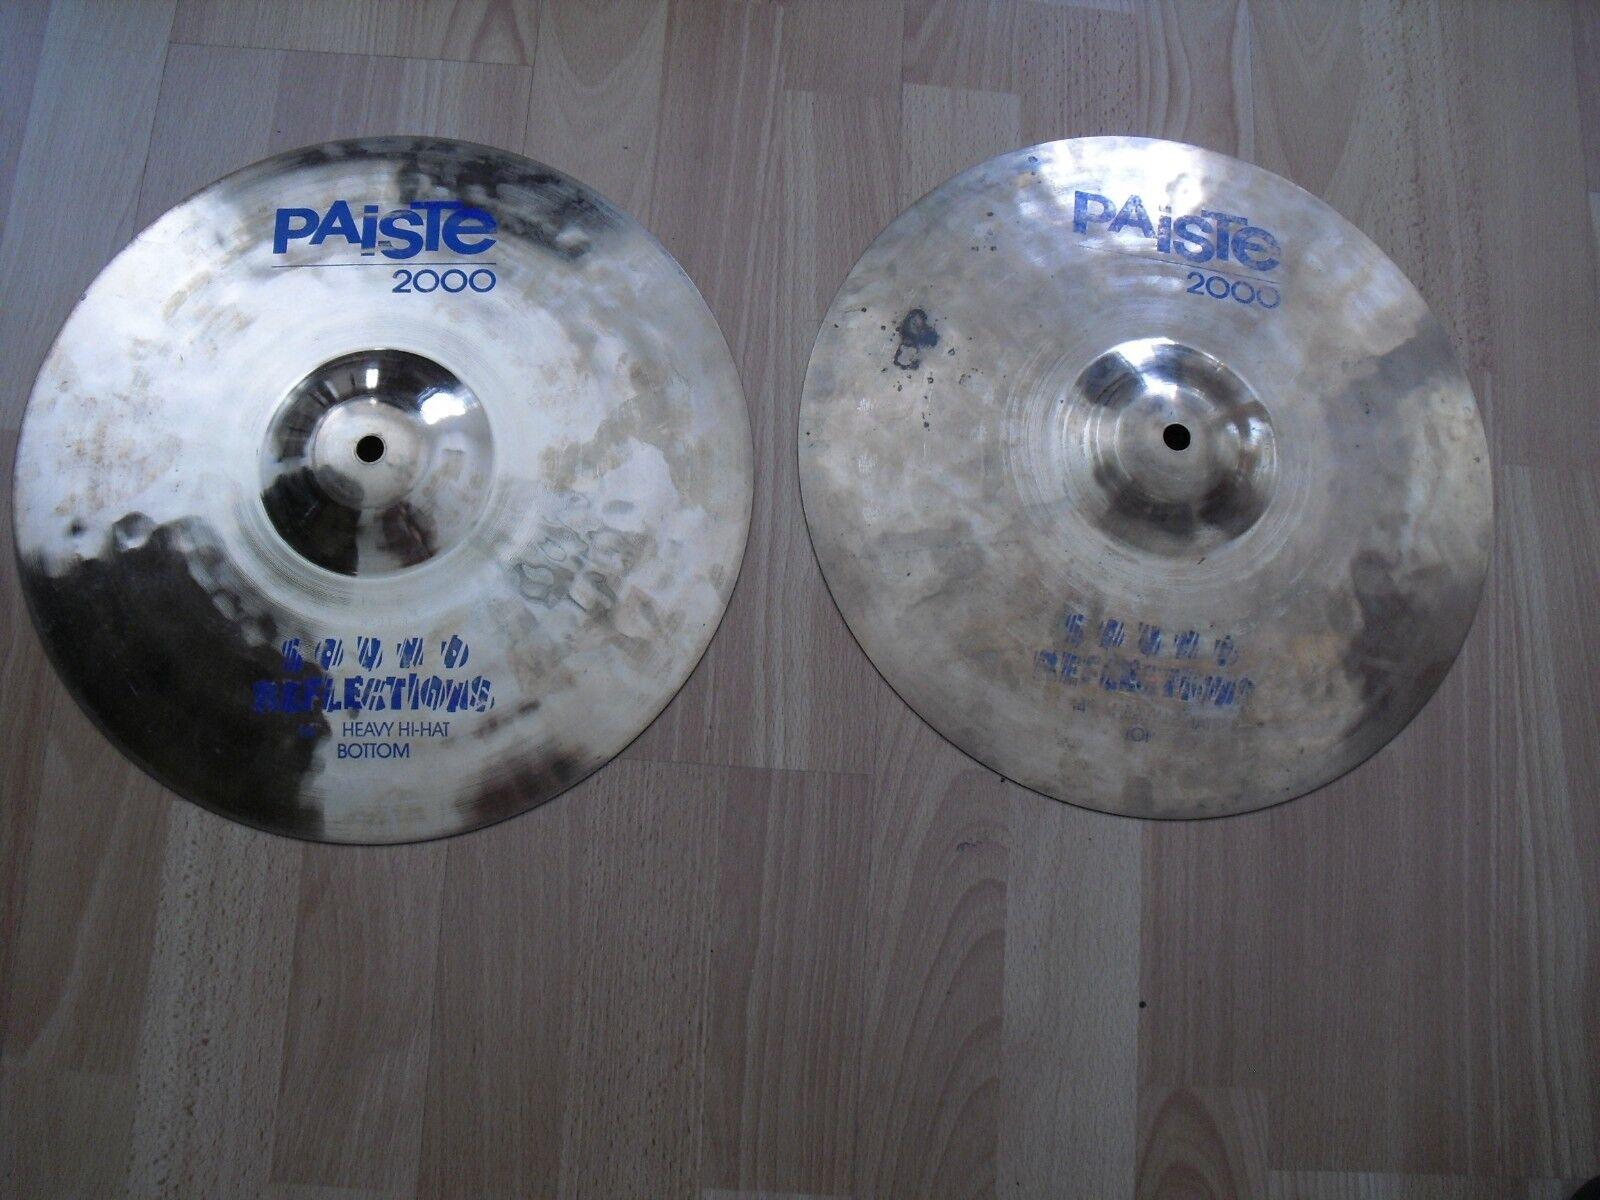 14  Paiste 2000 Sound Reflections Heavy Hi Hats HiHats Cymbals reflector finish